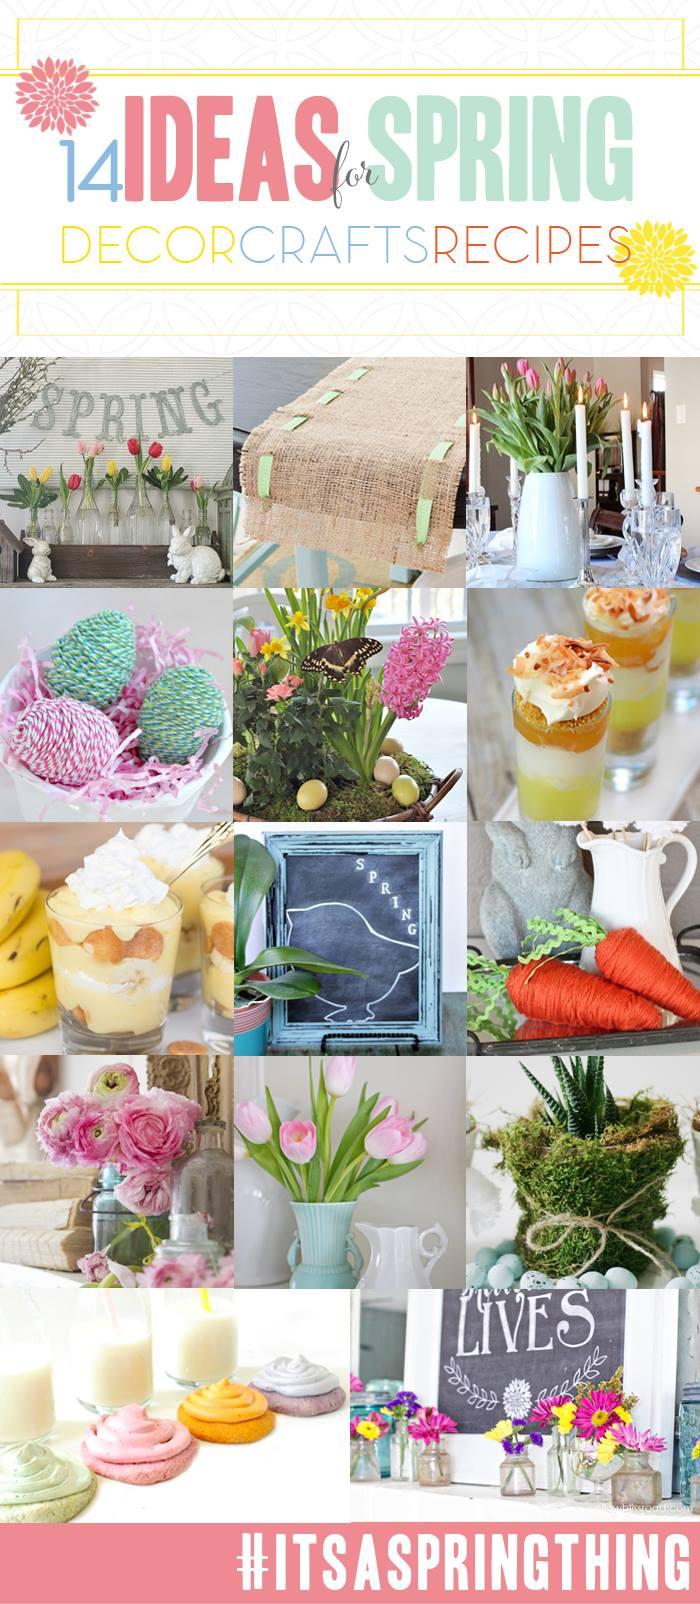 14 spring ideas